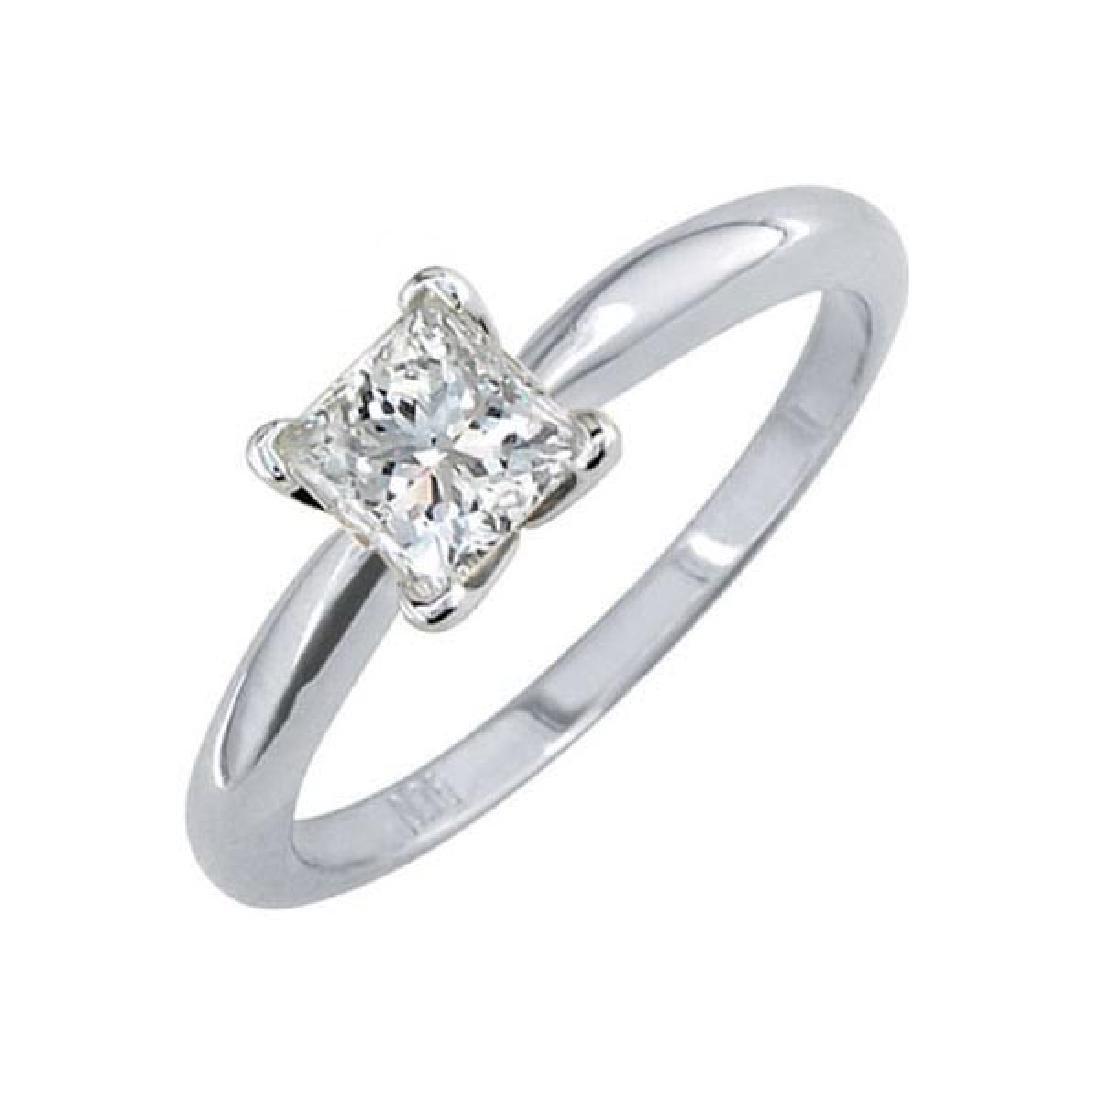 Certified 0.41 CTW Princess Diamond Solitaire 14k Ring